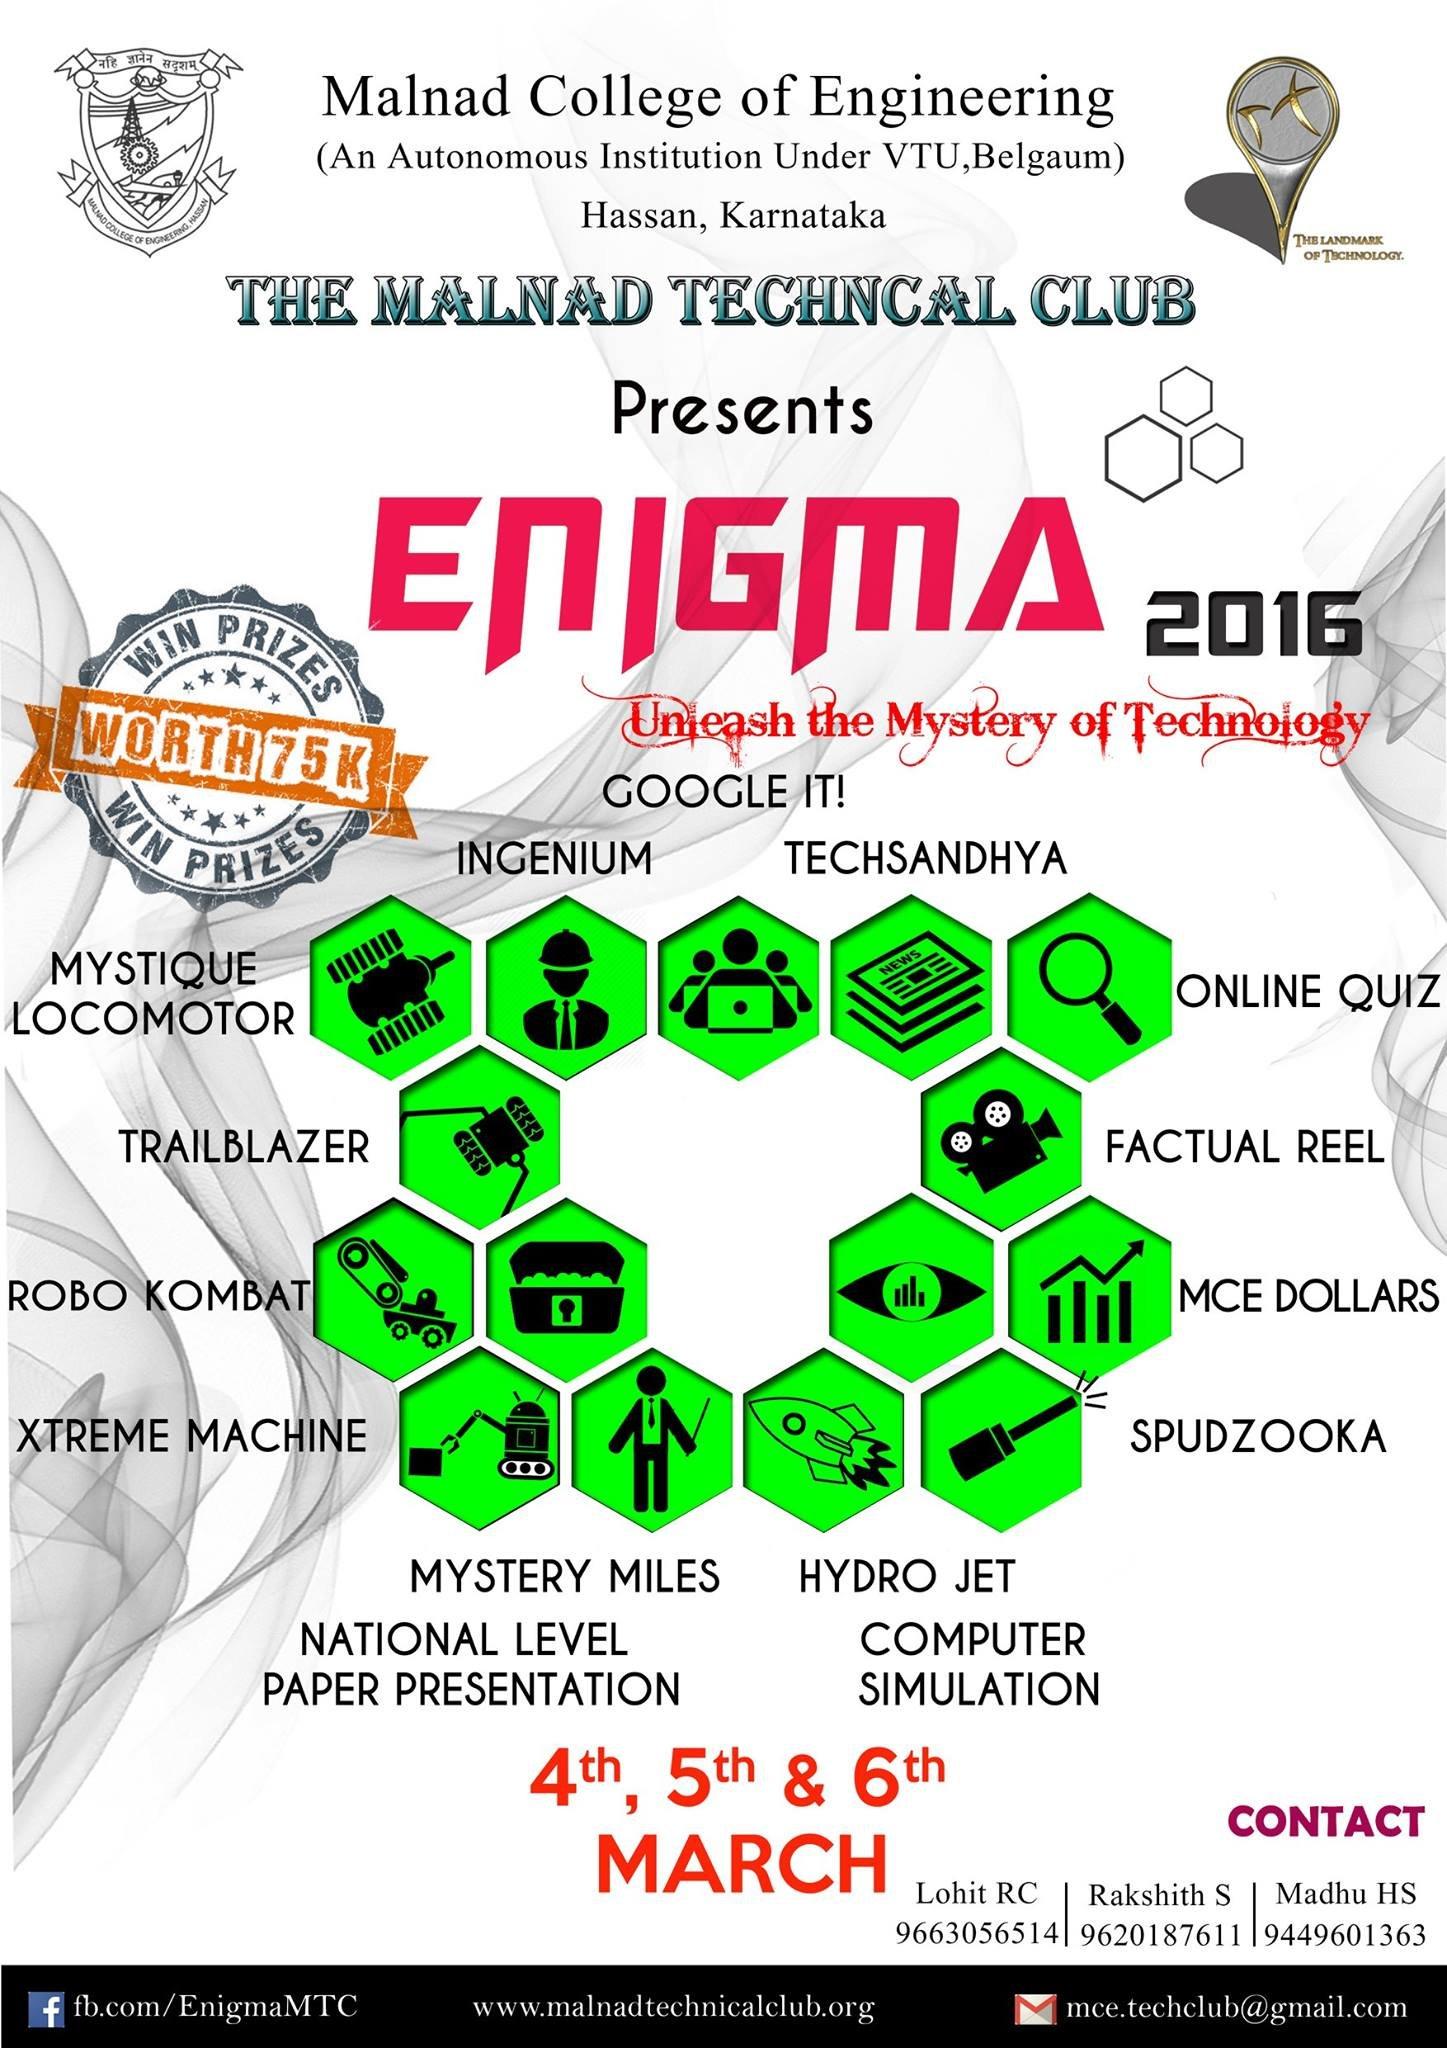 ENIGMA 2016 logo